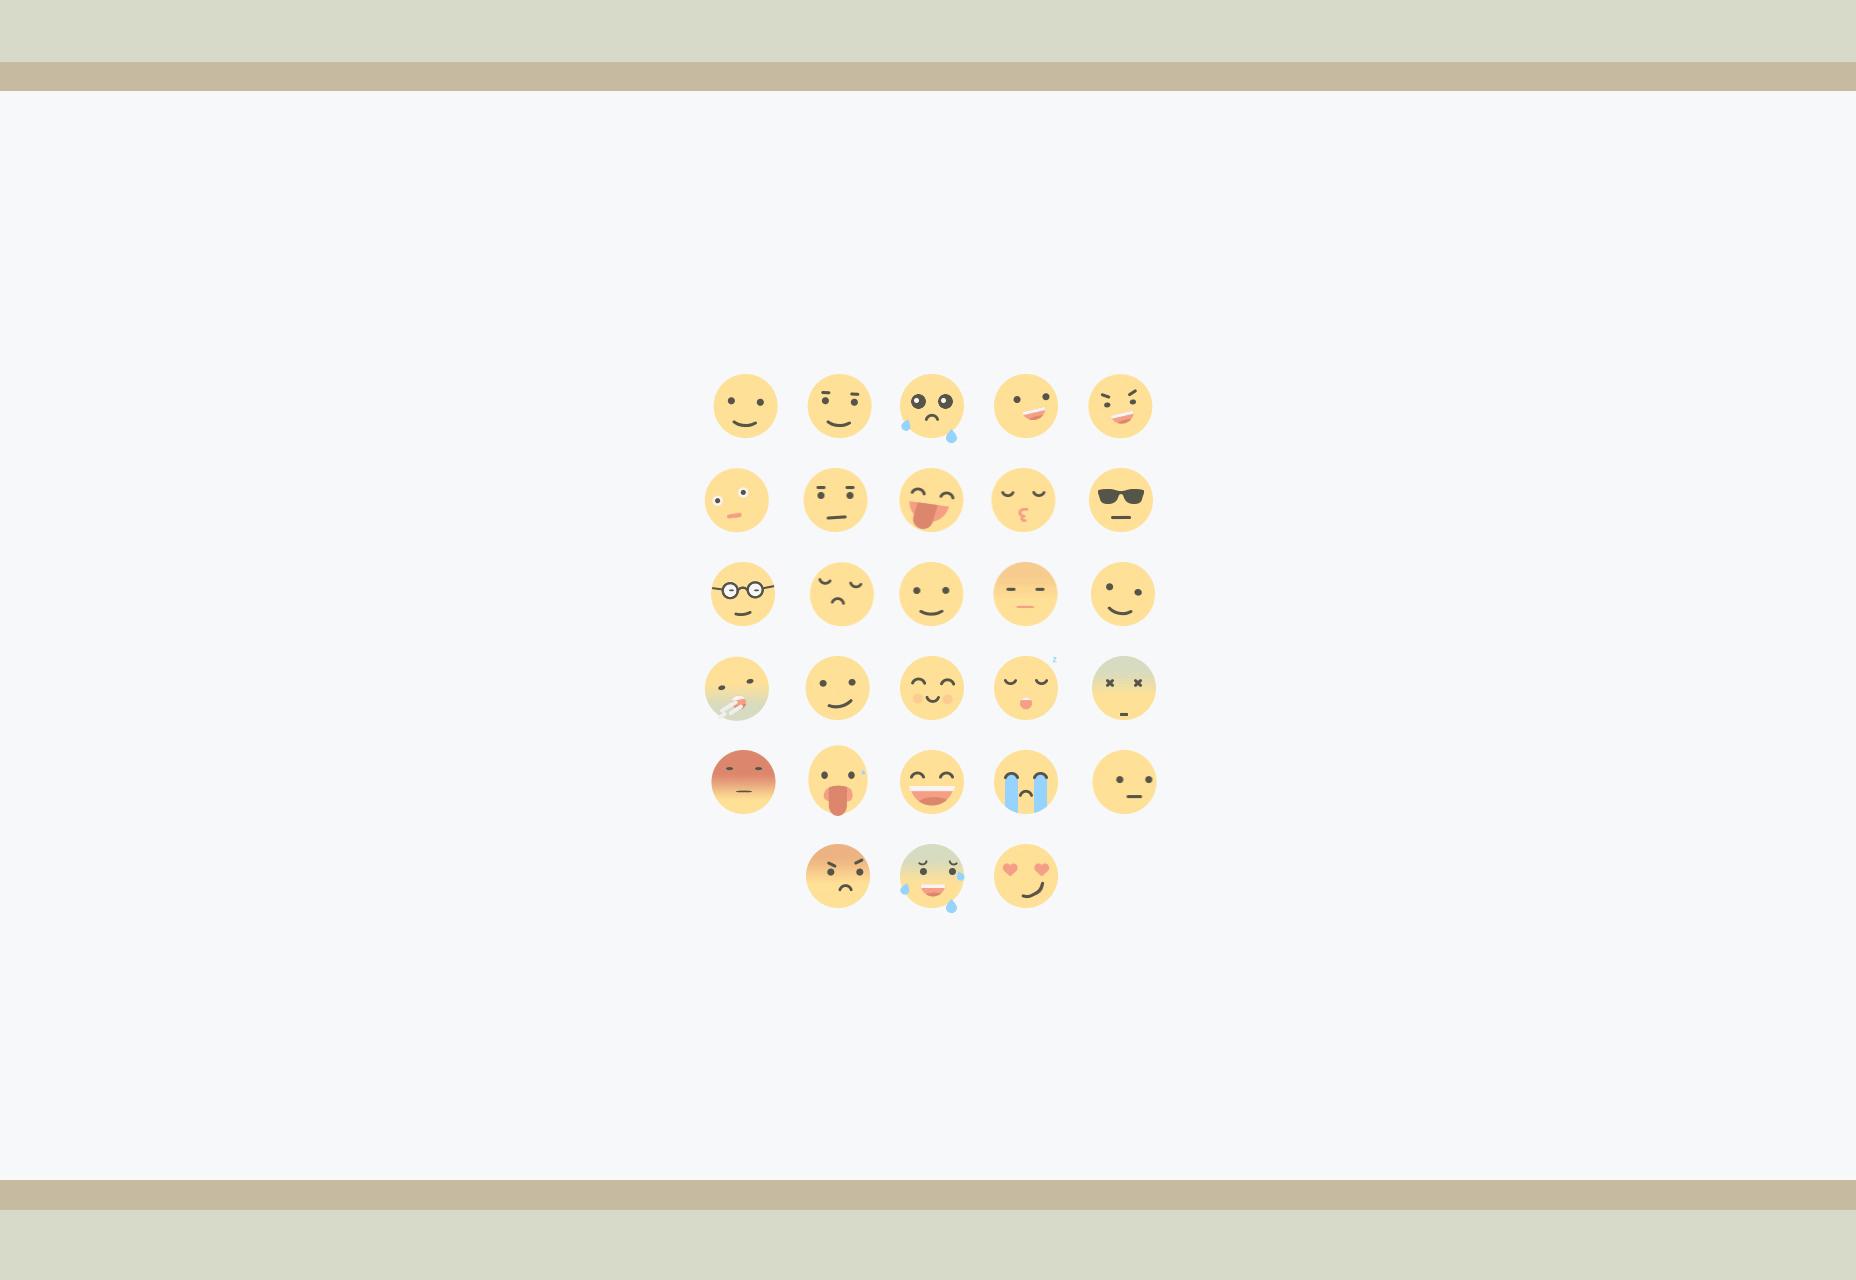 Adobe After Effects geanimeerde platte emoji's